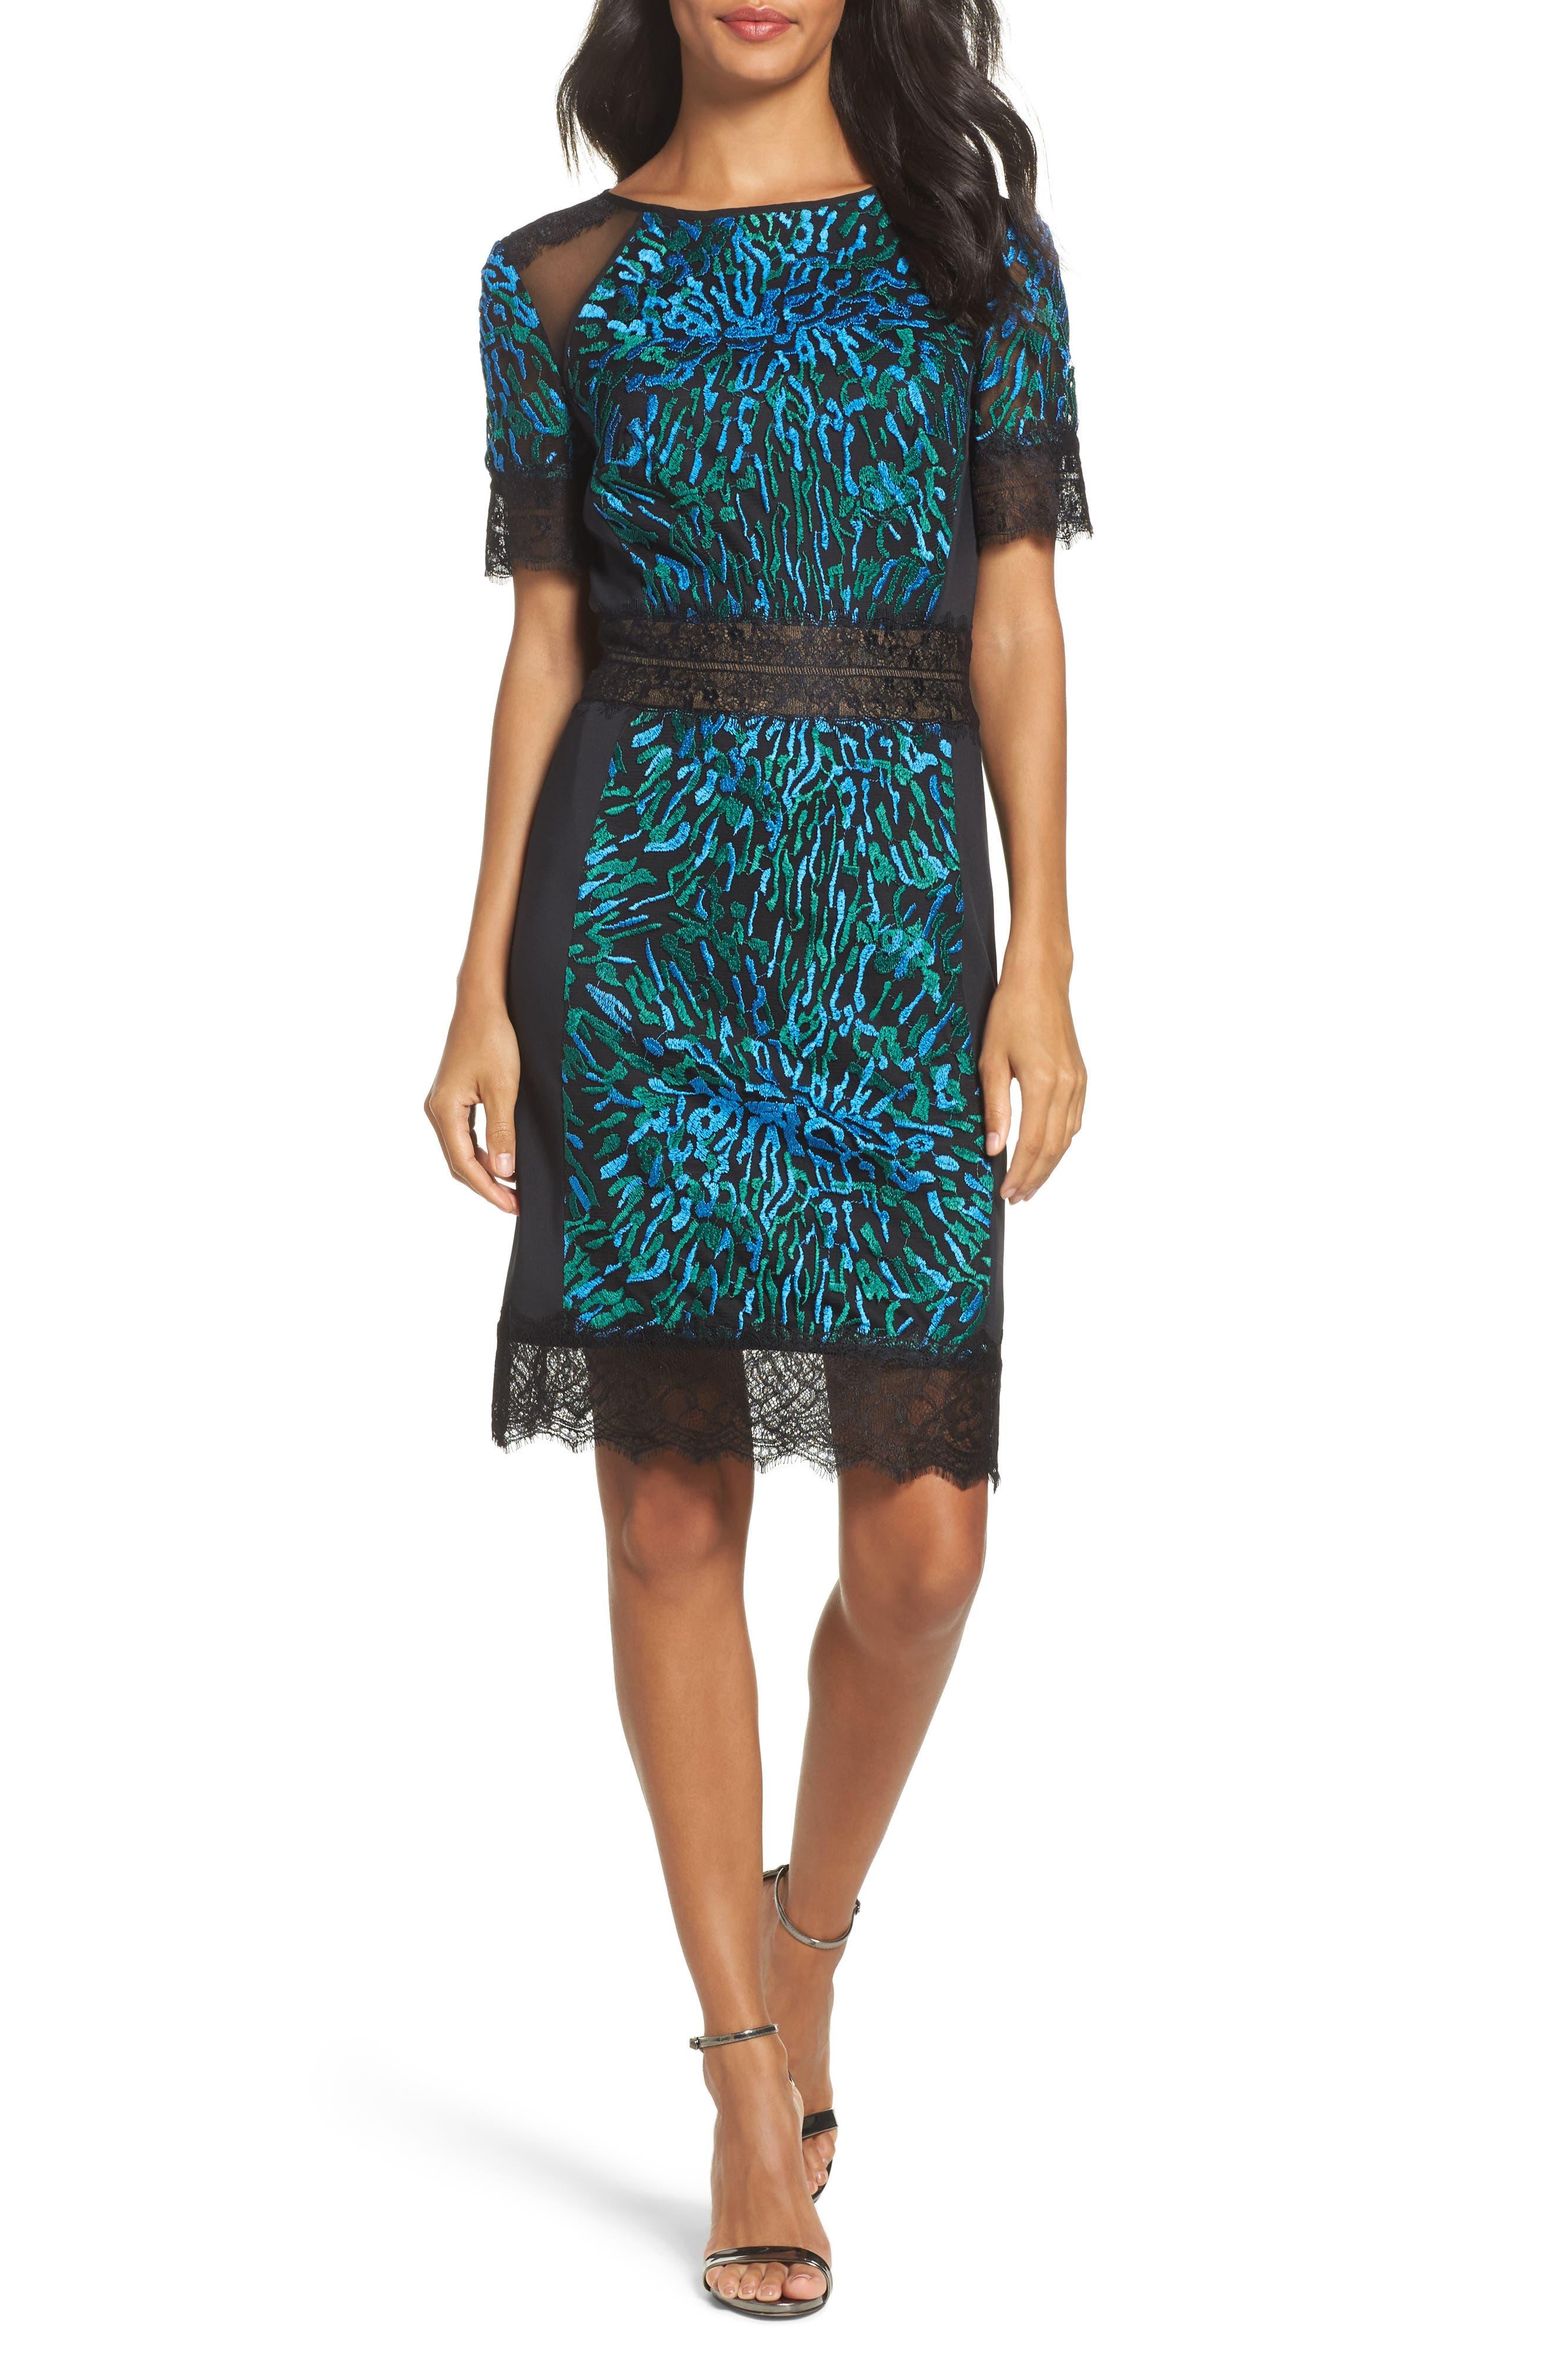 Main Image - Tadashi Shoji Illusion Lace & Embroidered Mesh Sheath Dress